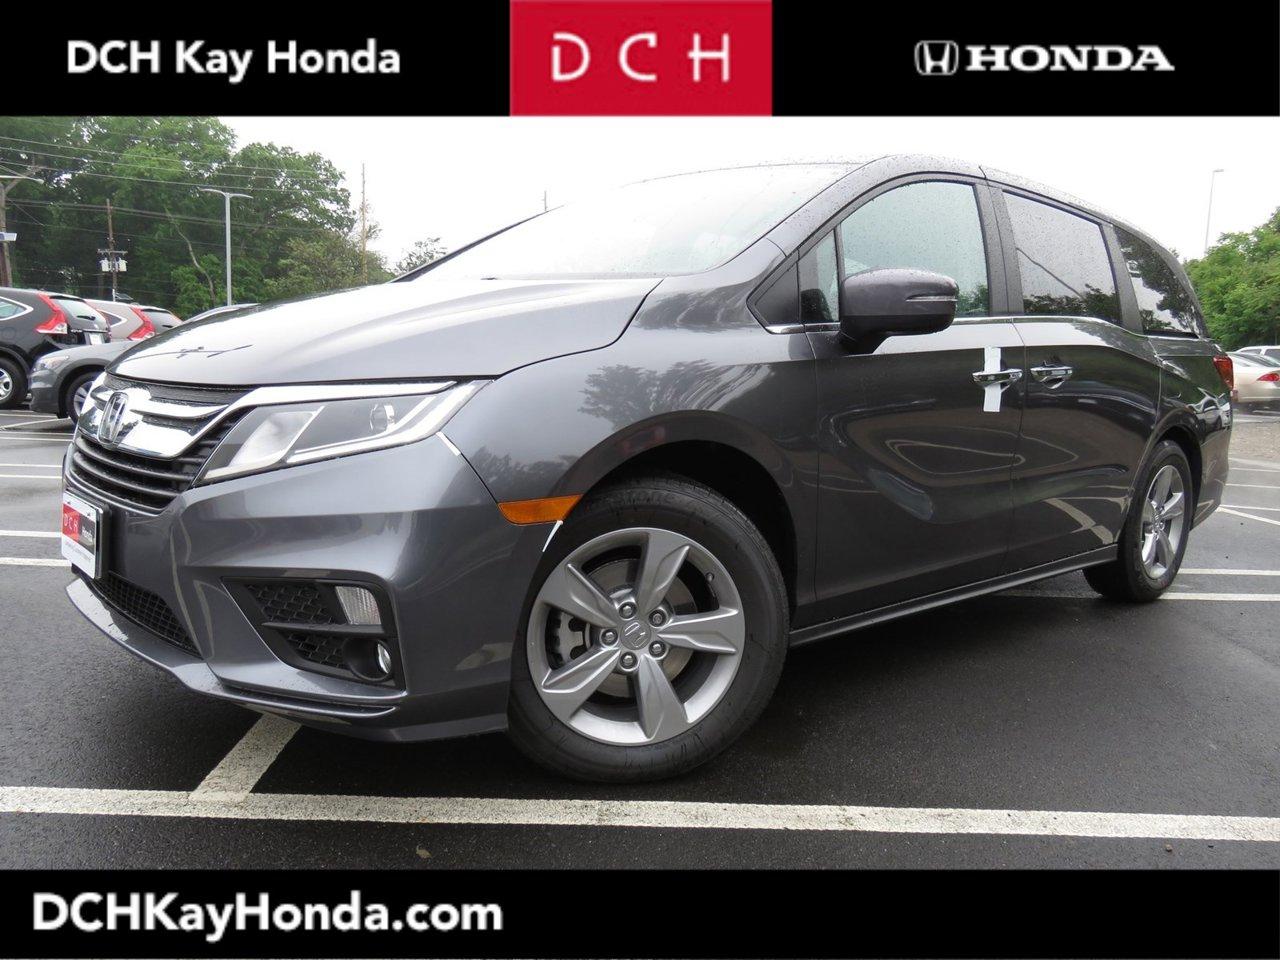 New 2020 Honda Odyssey in Eatontown, NJ